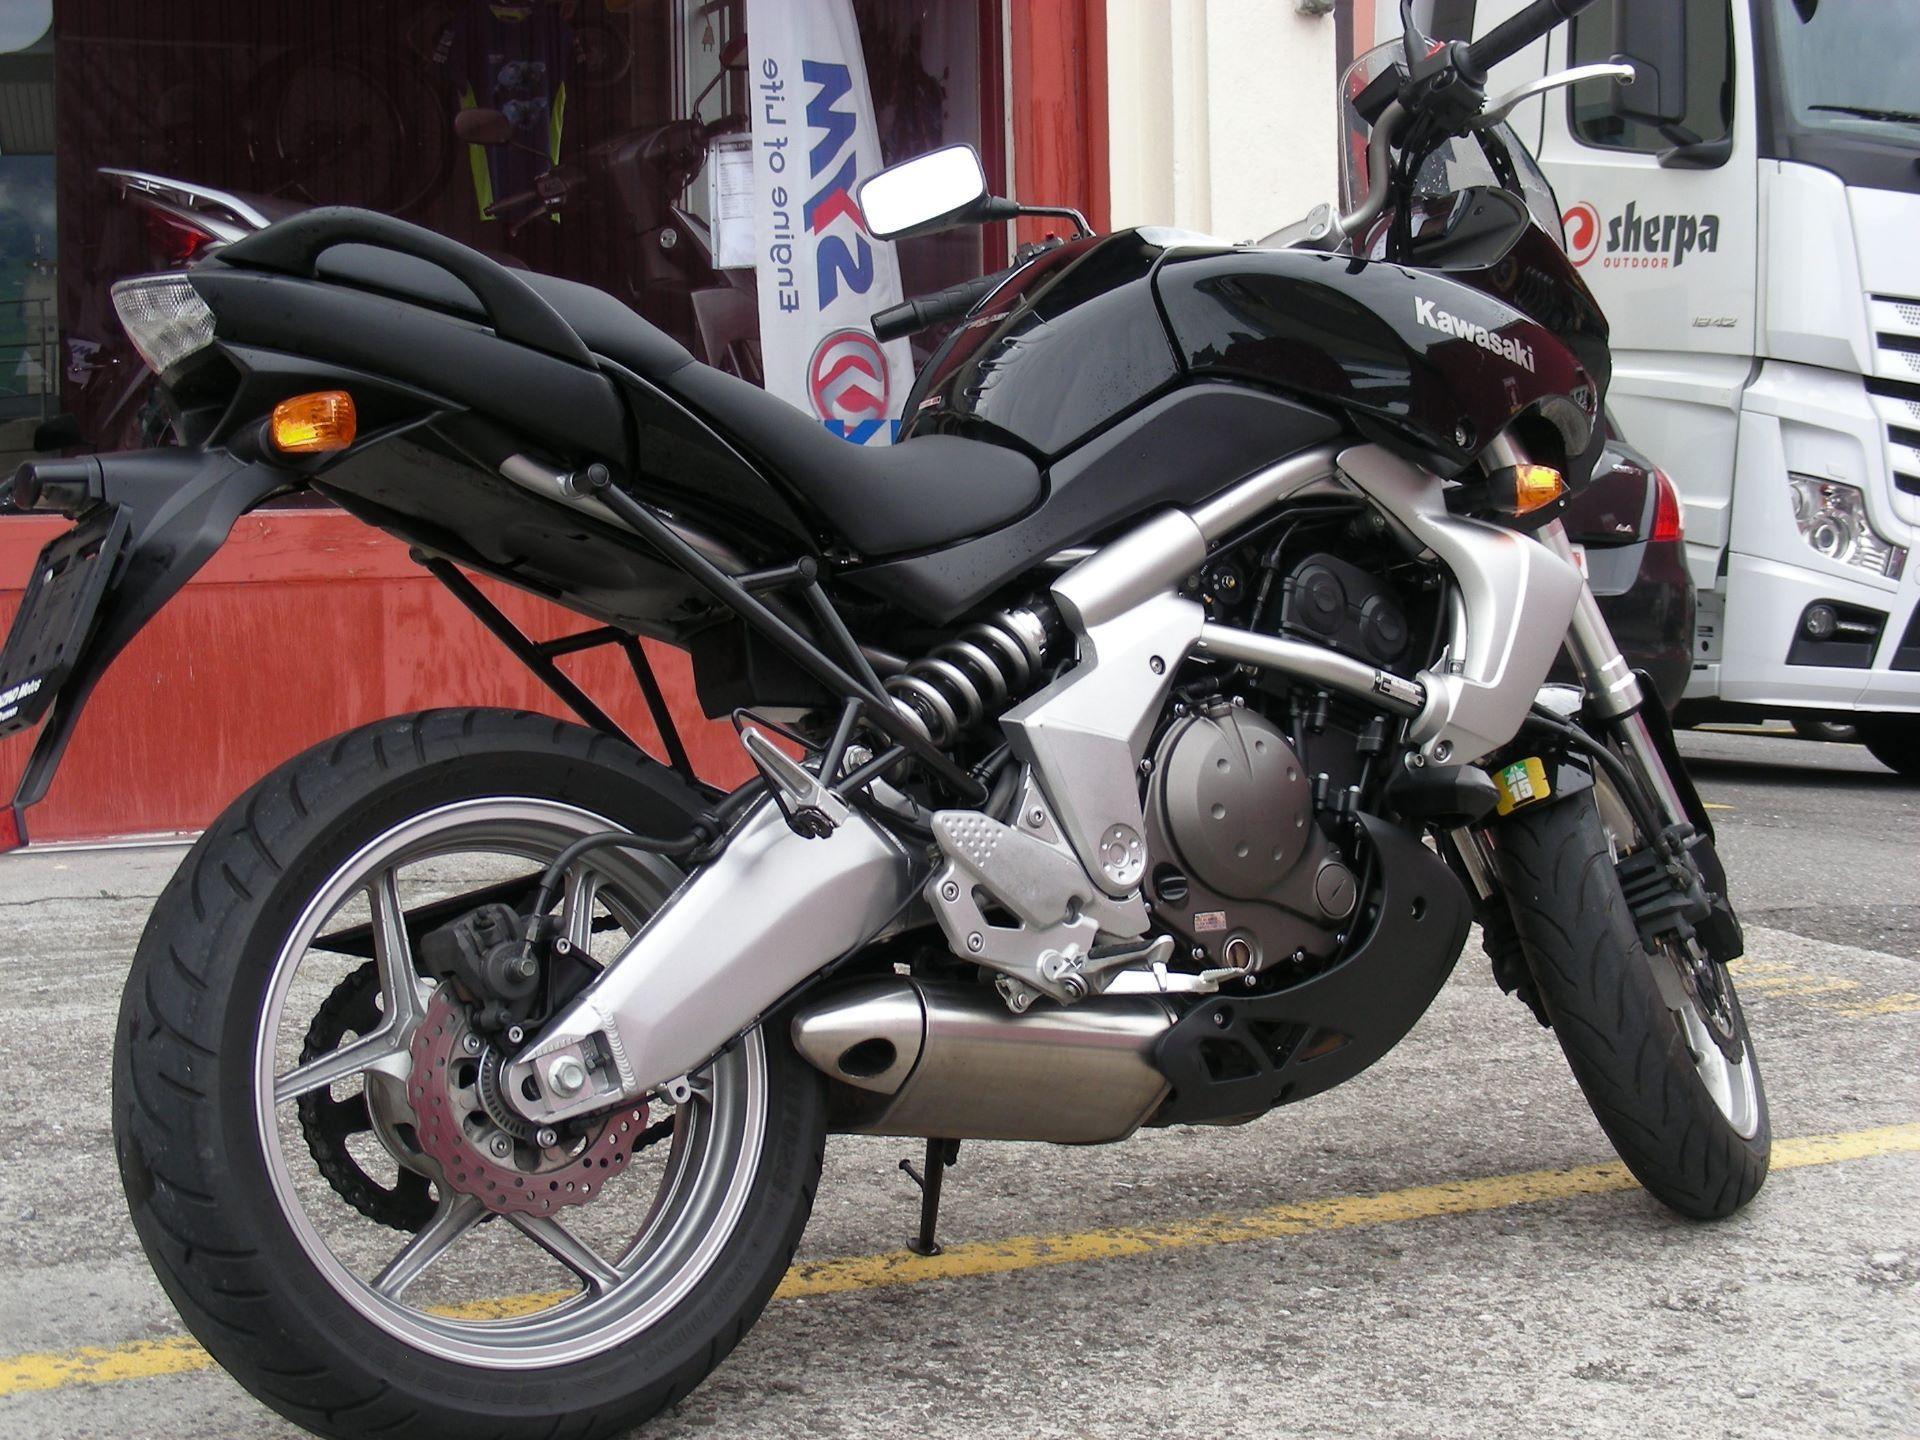 motorrad occasion kaufen kawasaki versys 650 camenzind motos brunnen. Black Bedroom Furniture Sets. Home Design Ideas